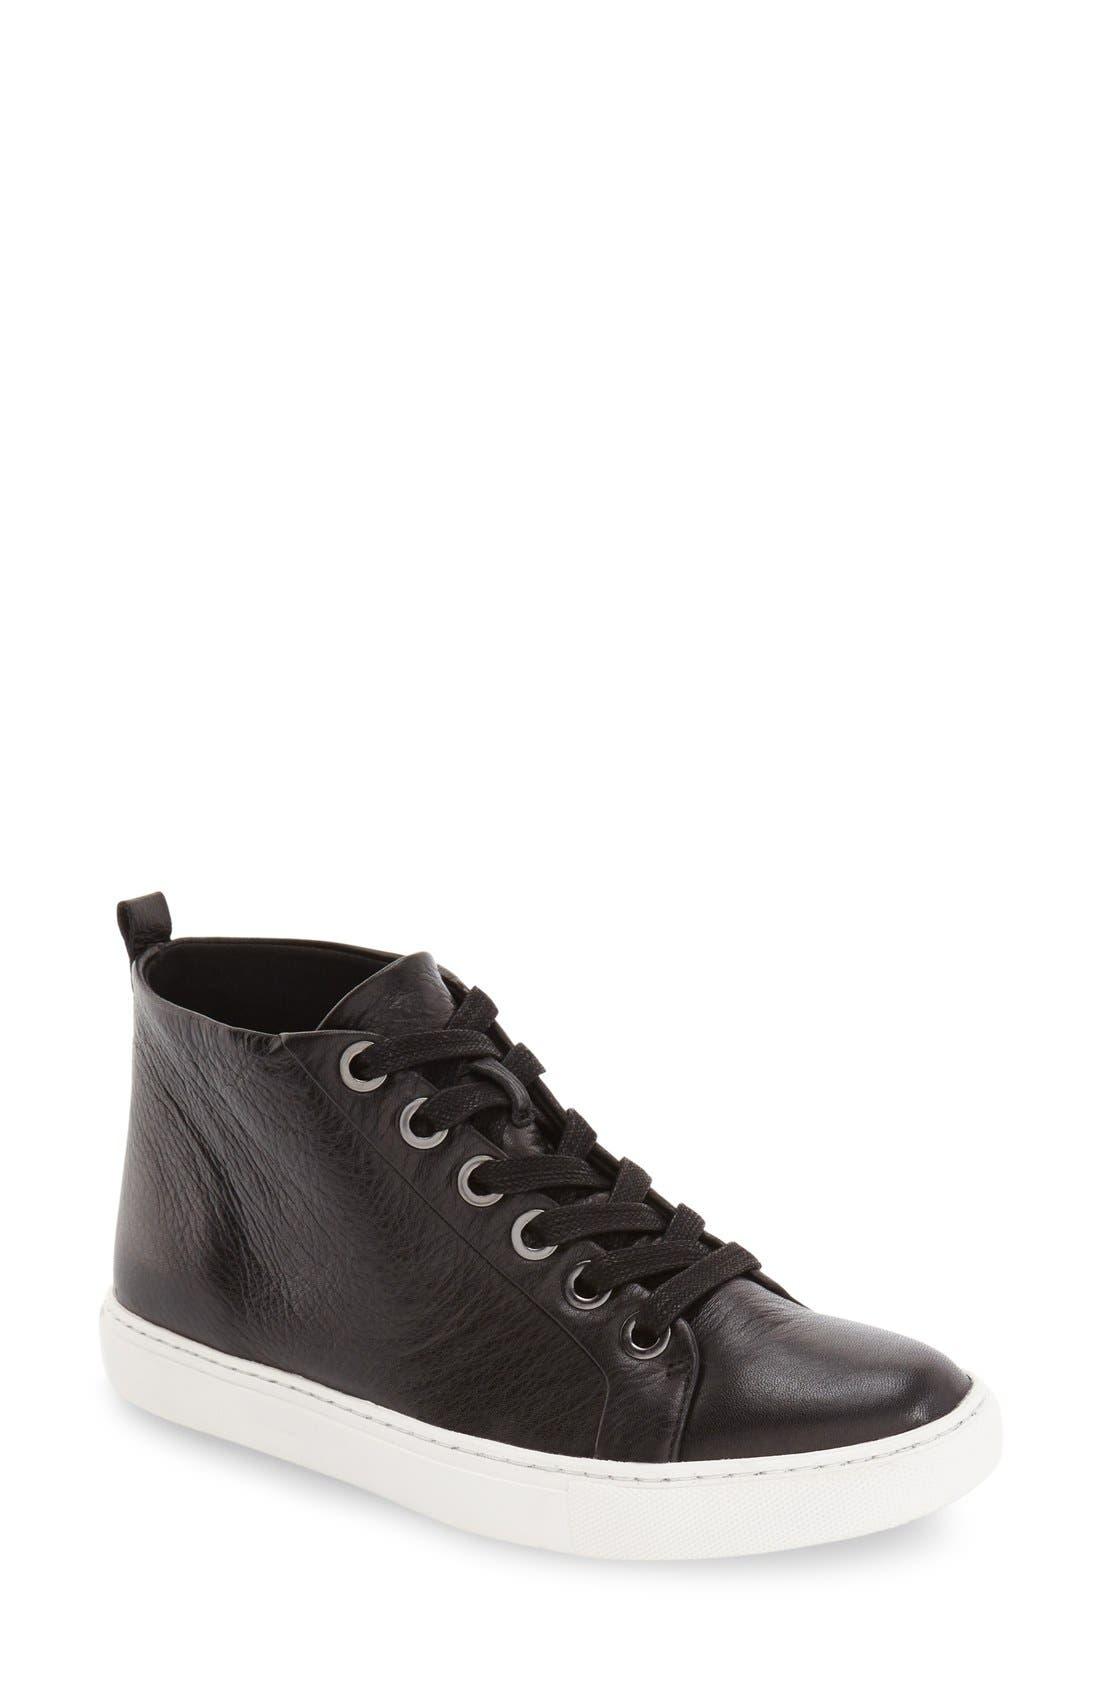 Kenneth Cole New York 'Kaleb' High Top Sneaker (Women)